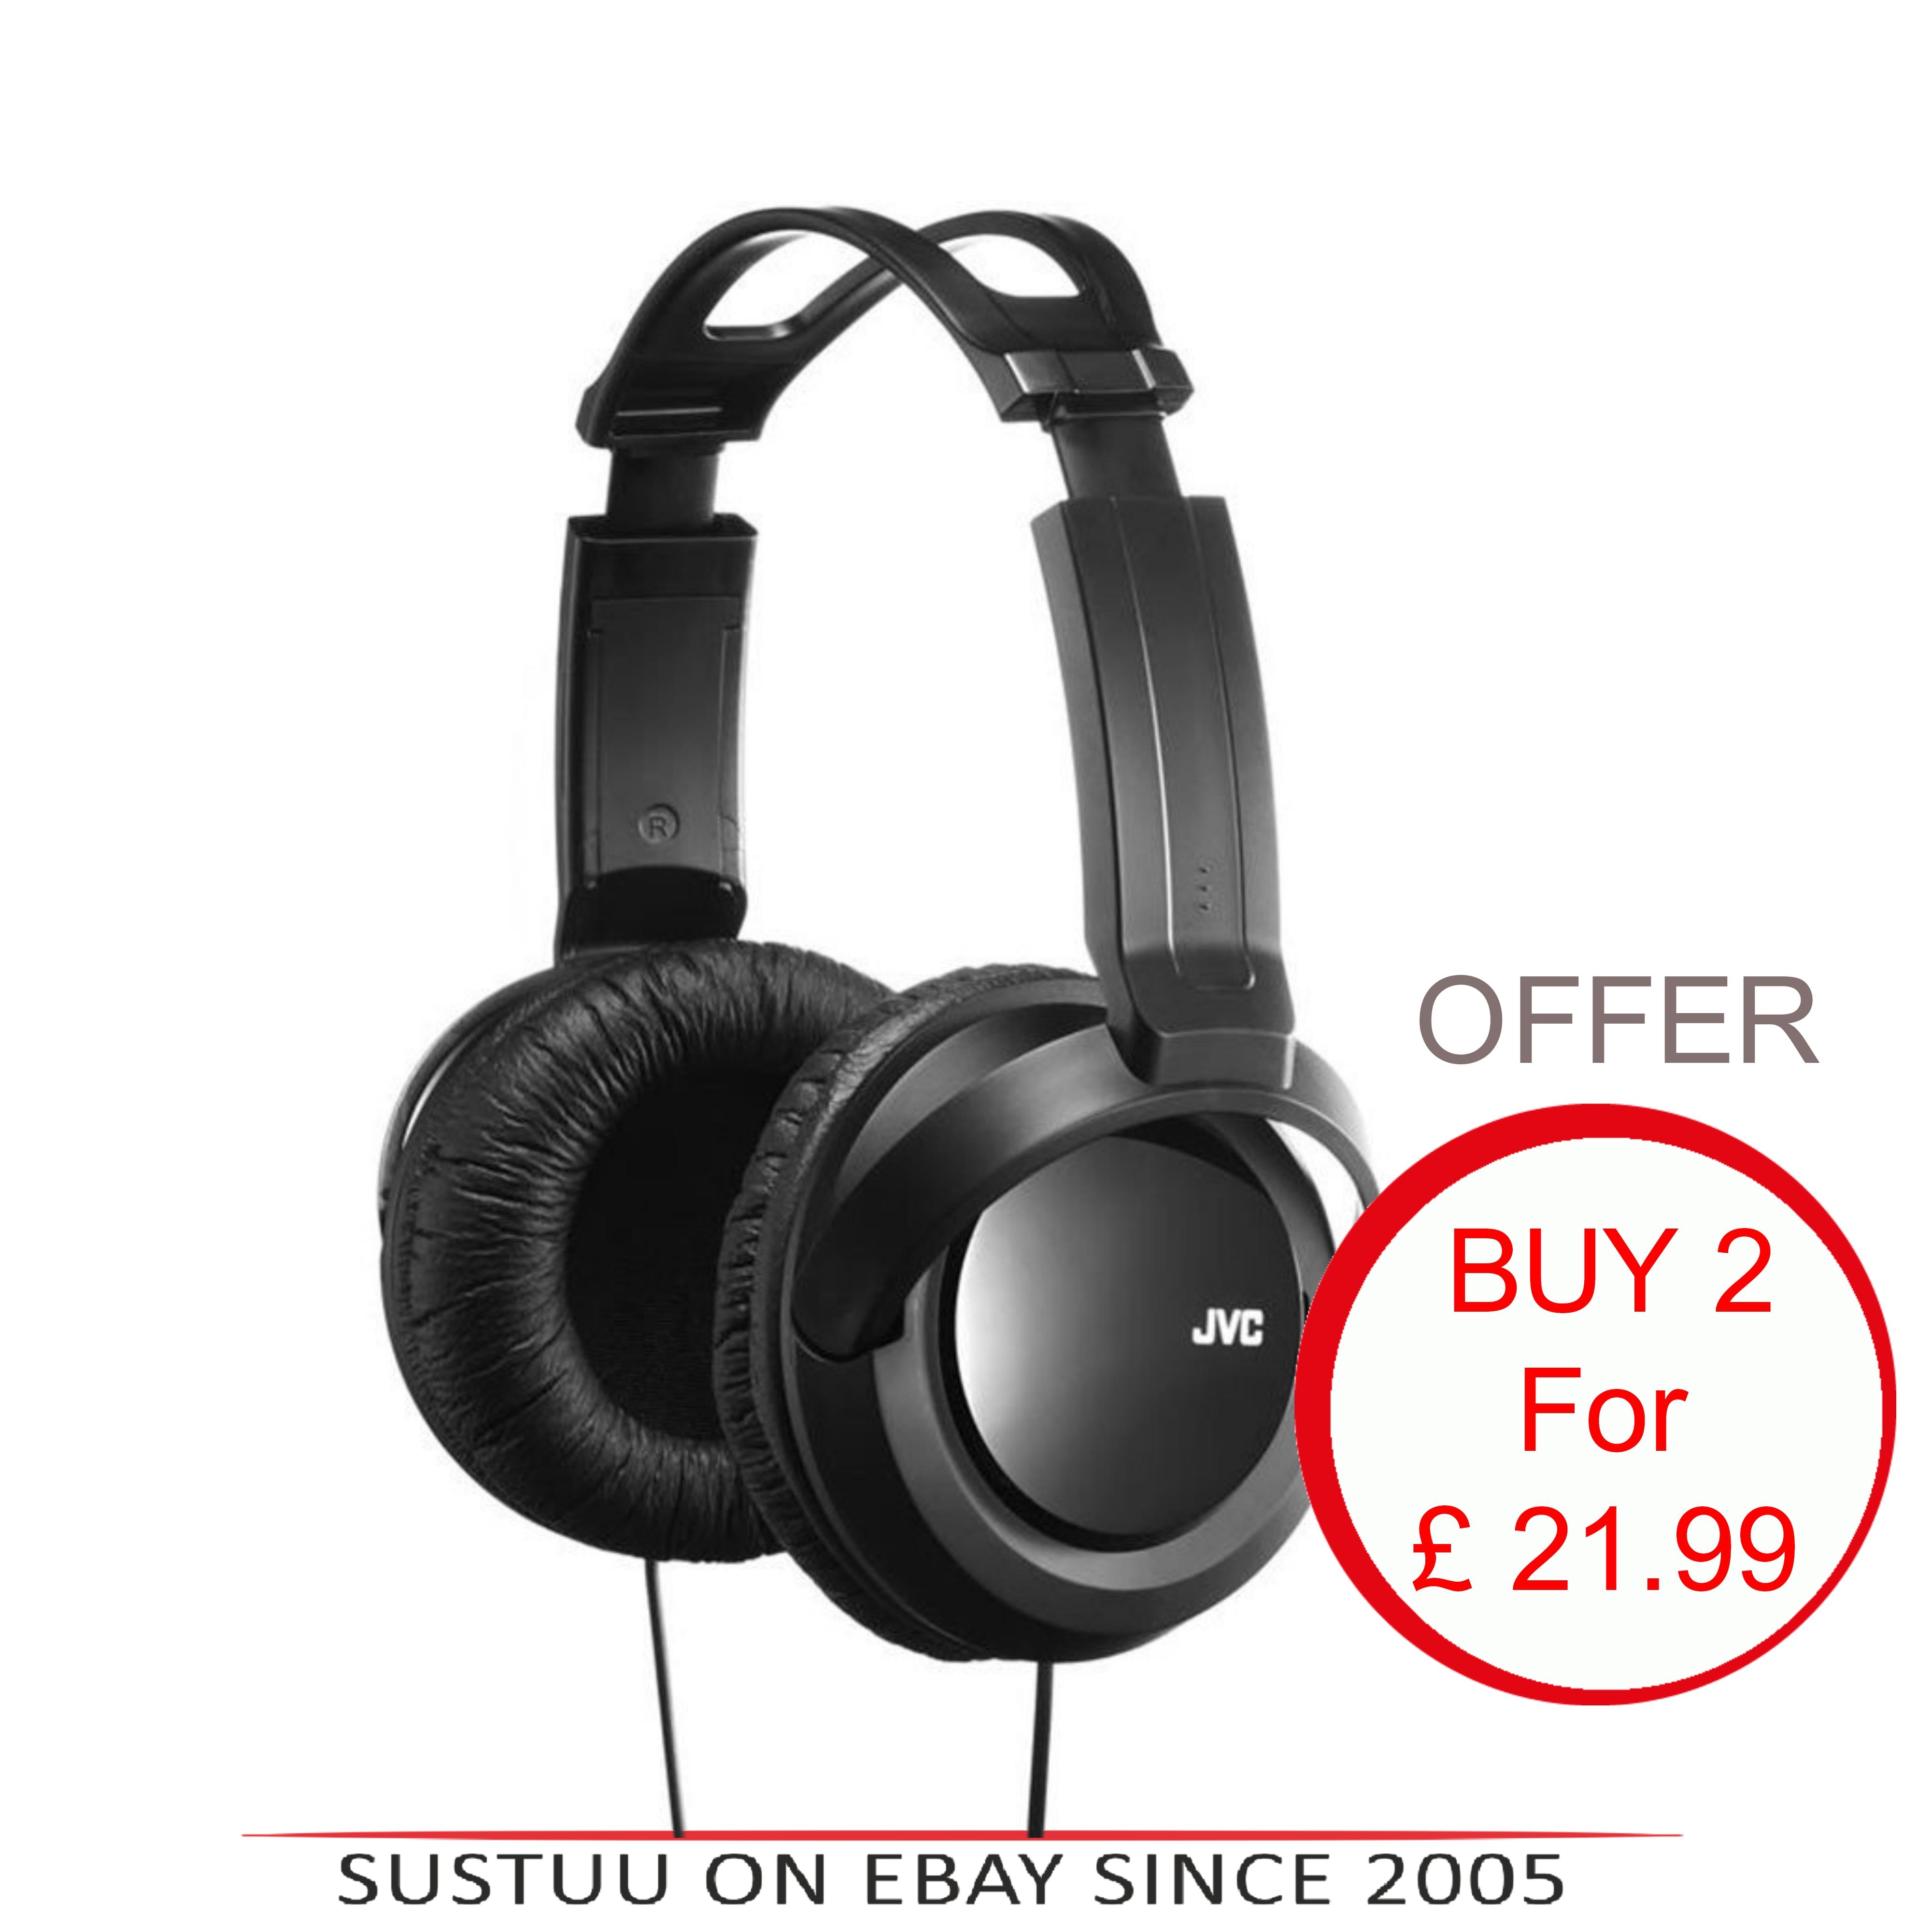 JVC HARX330|DJ Headphone|Over-Ear|Full-Size Deep Bass Stereo|2.5mCord x 2 Units